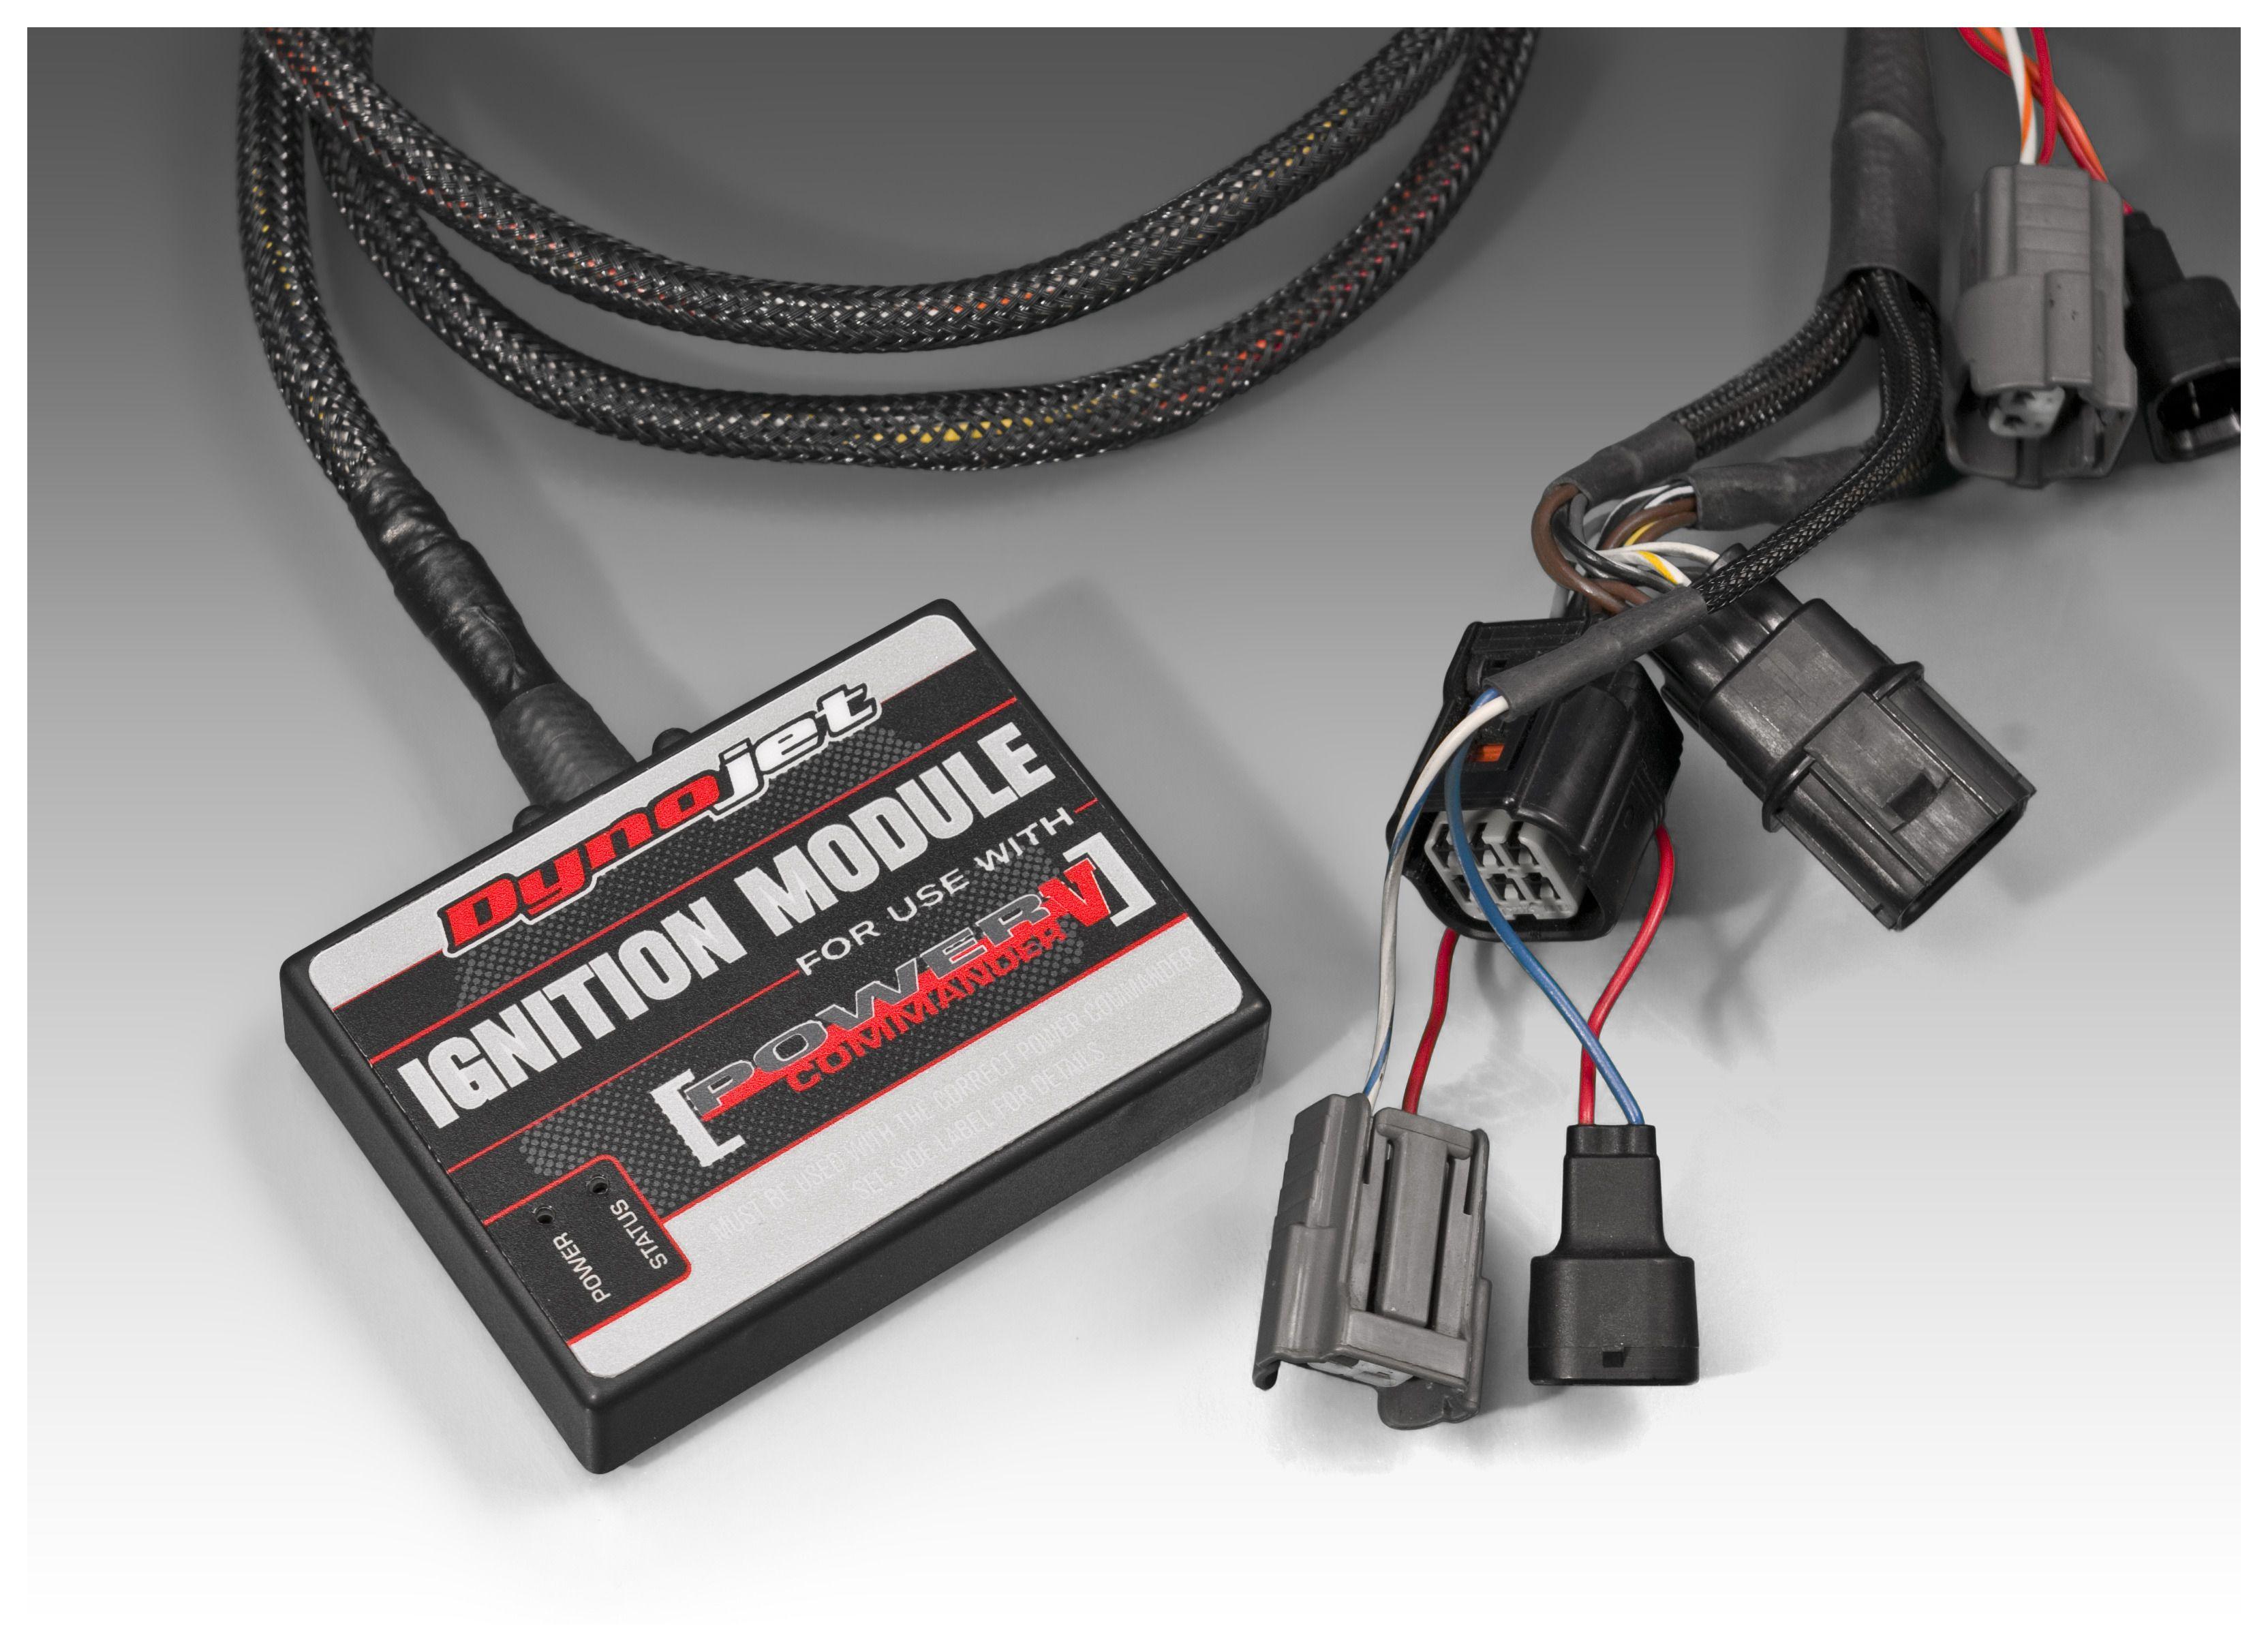 dynojet power commander v ignition module honda cbrrr  dynojet power commander v ignition module honda cbr600rr 2007 2016 revzilla